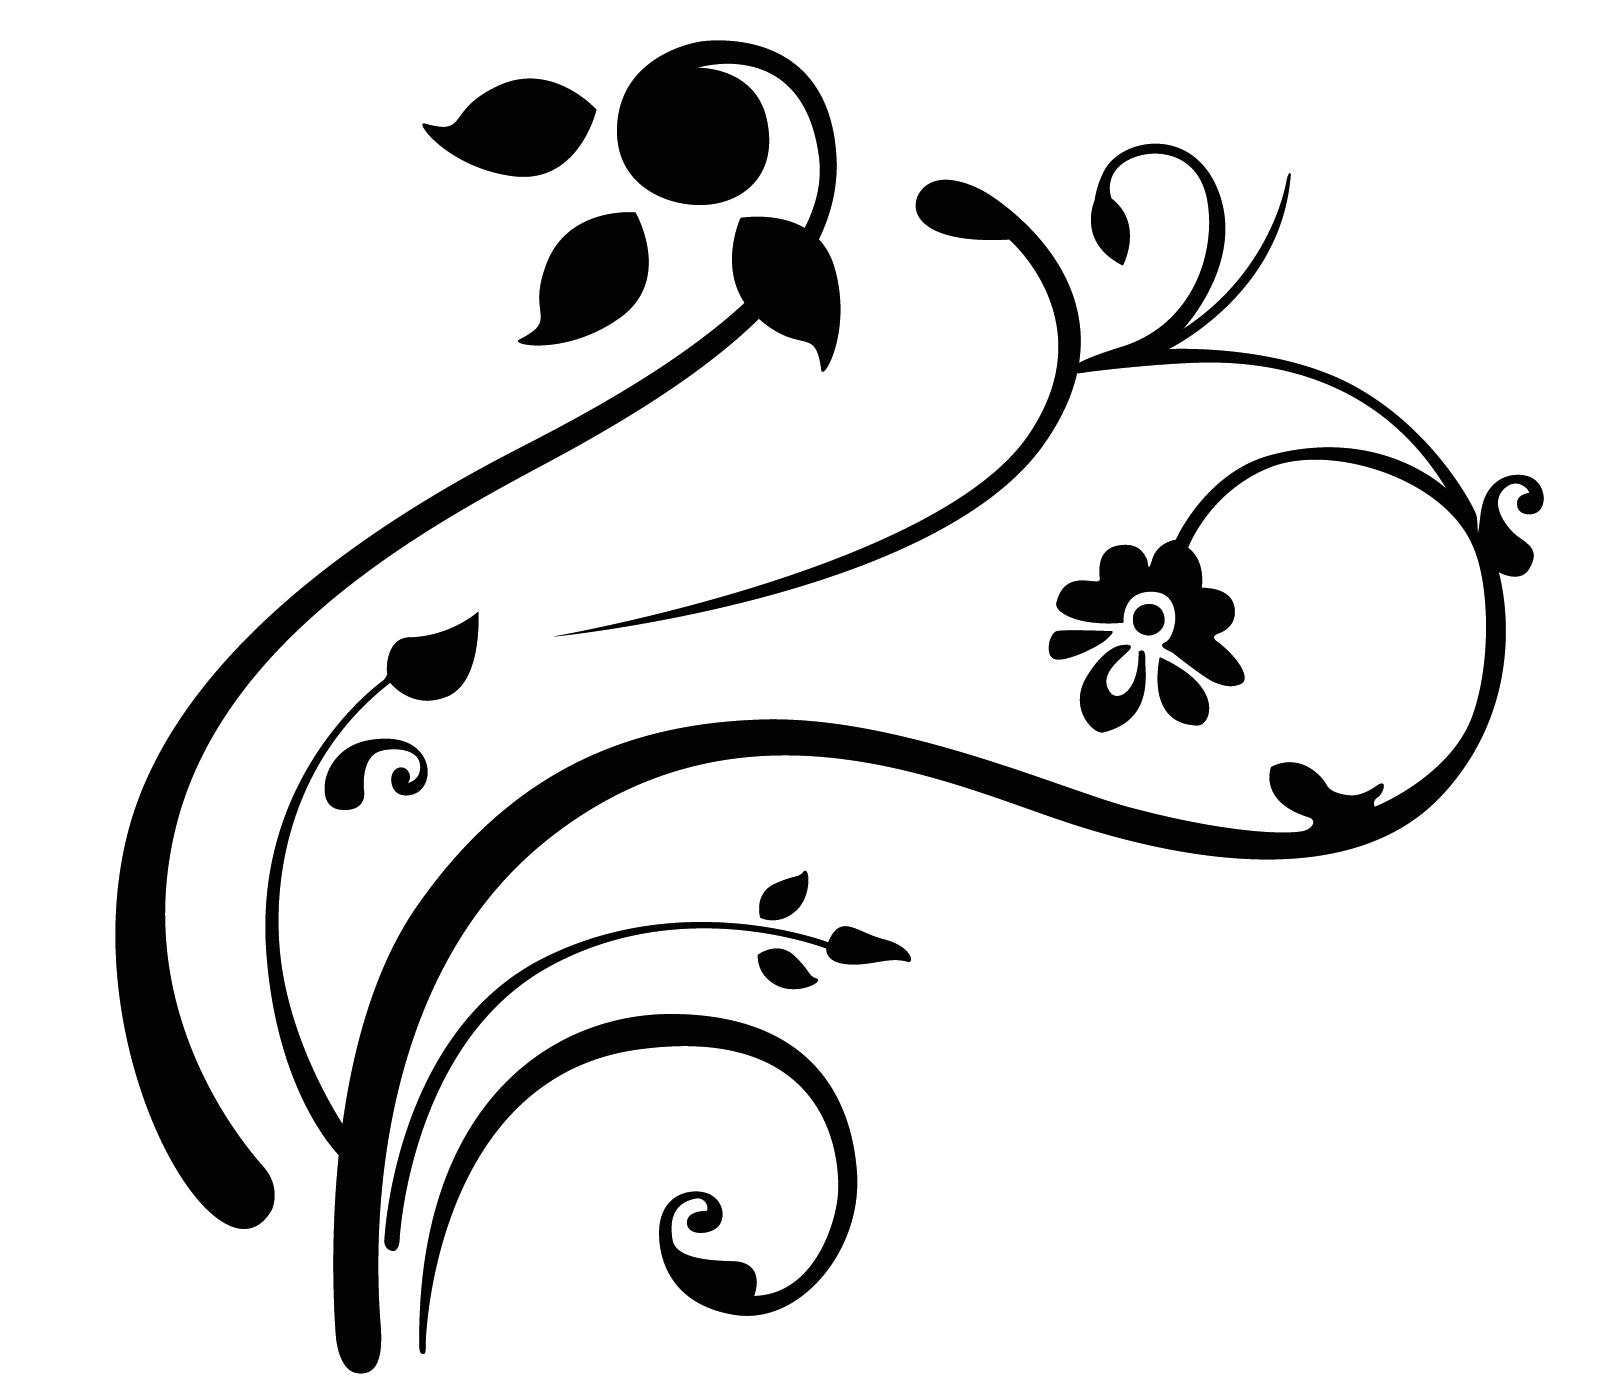 Swirl Design Clip Art Free